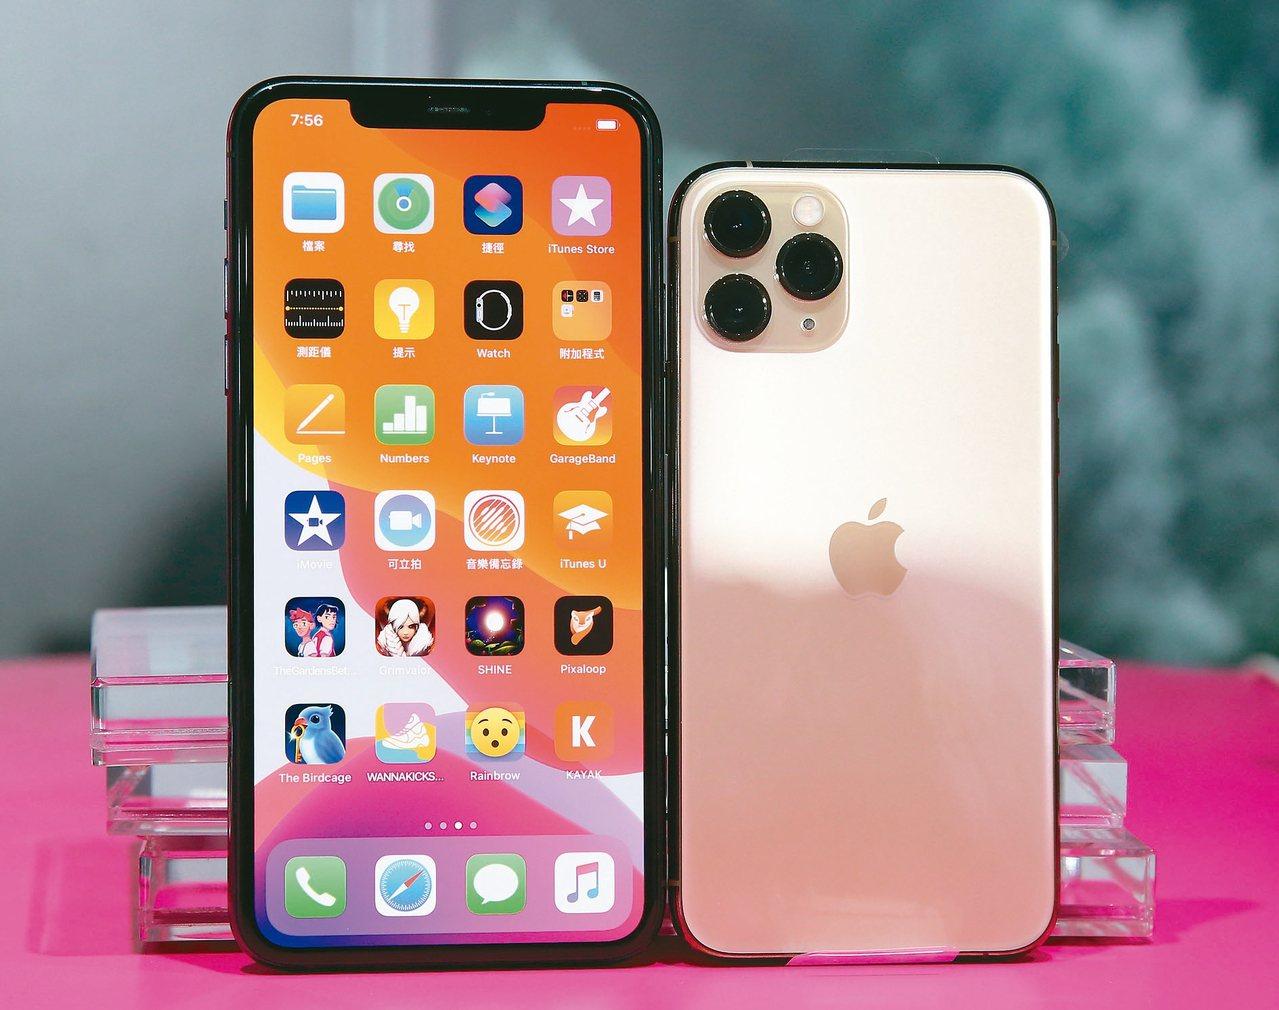 iPhone11開賣,上百果粉在信義威秀外排隊。聯合報記者林澔一/攝影